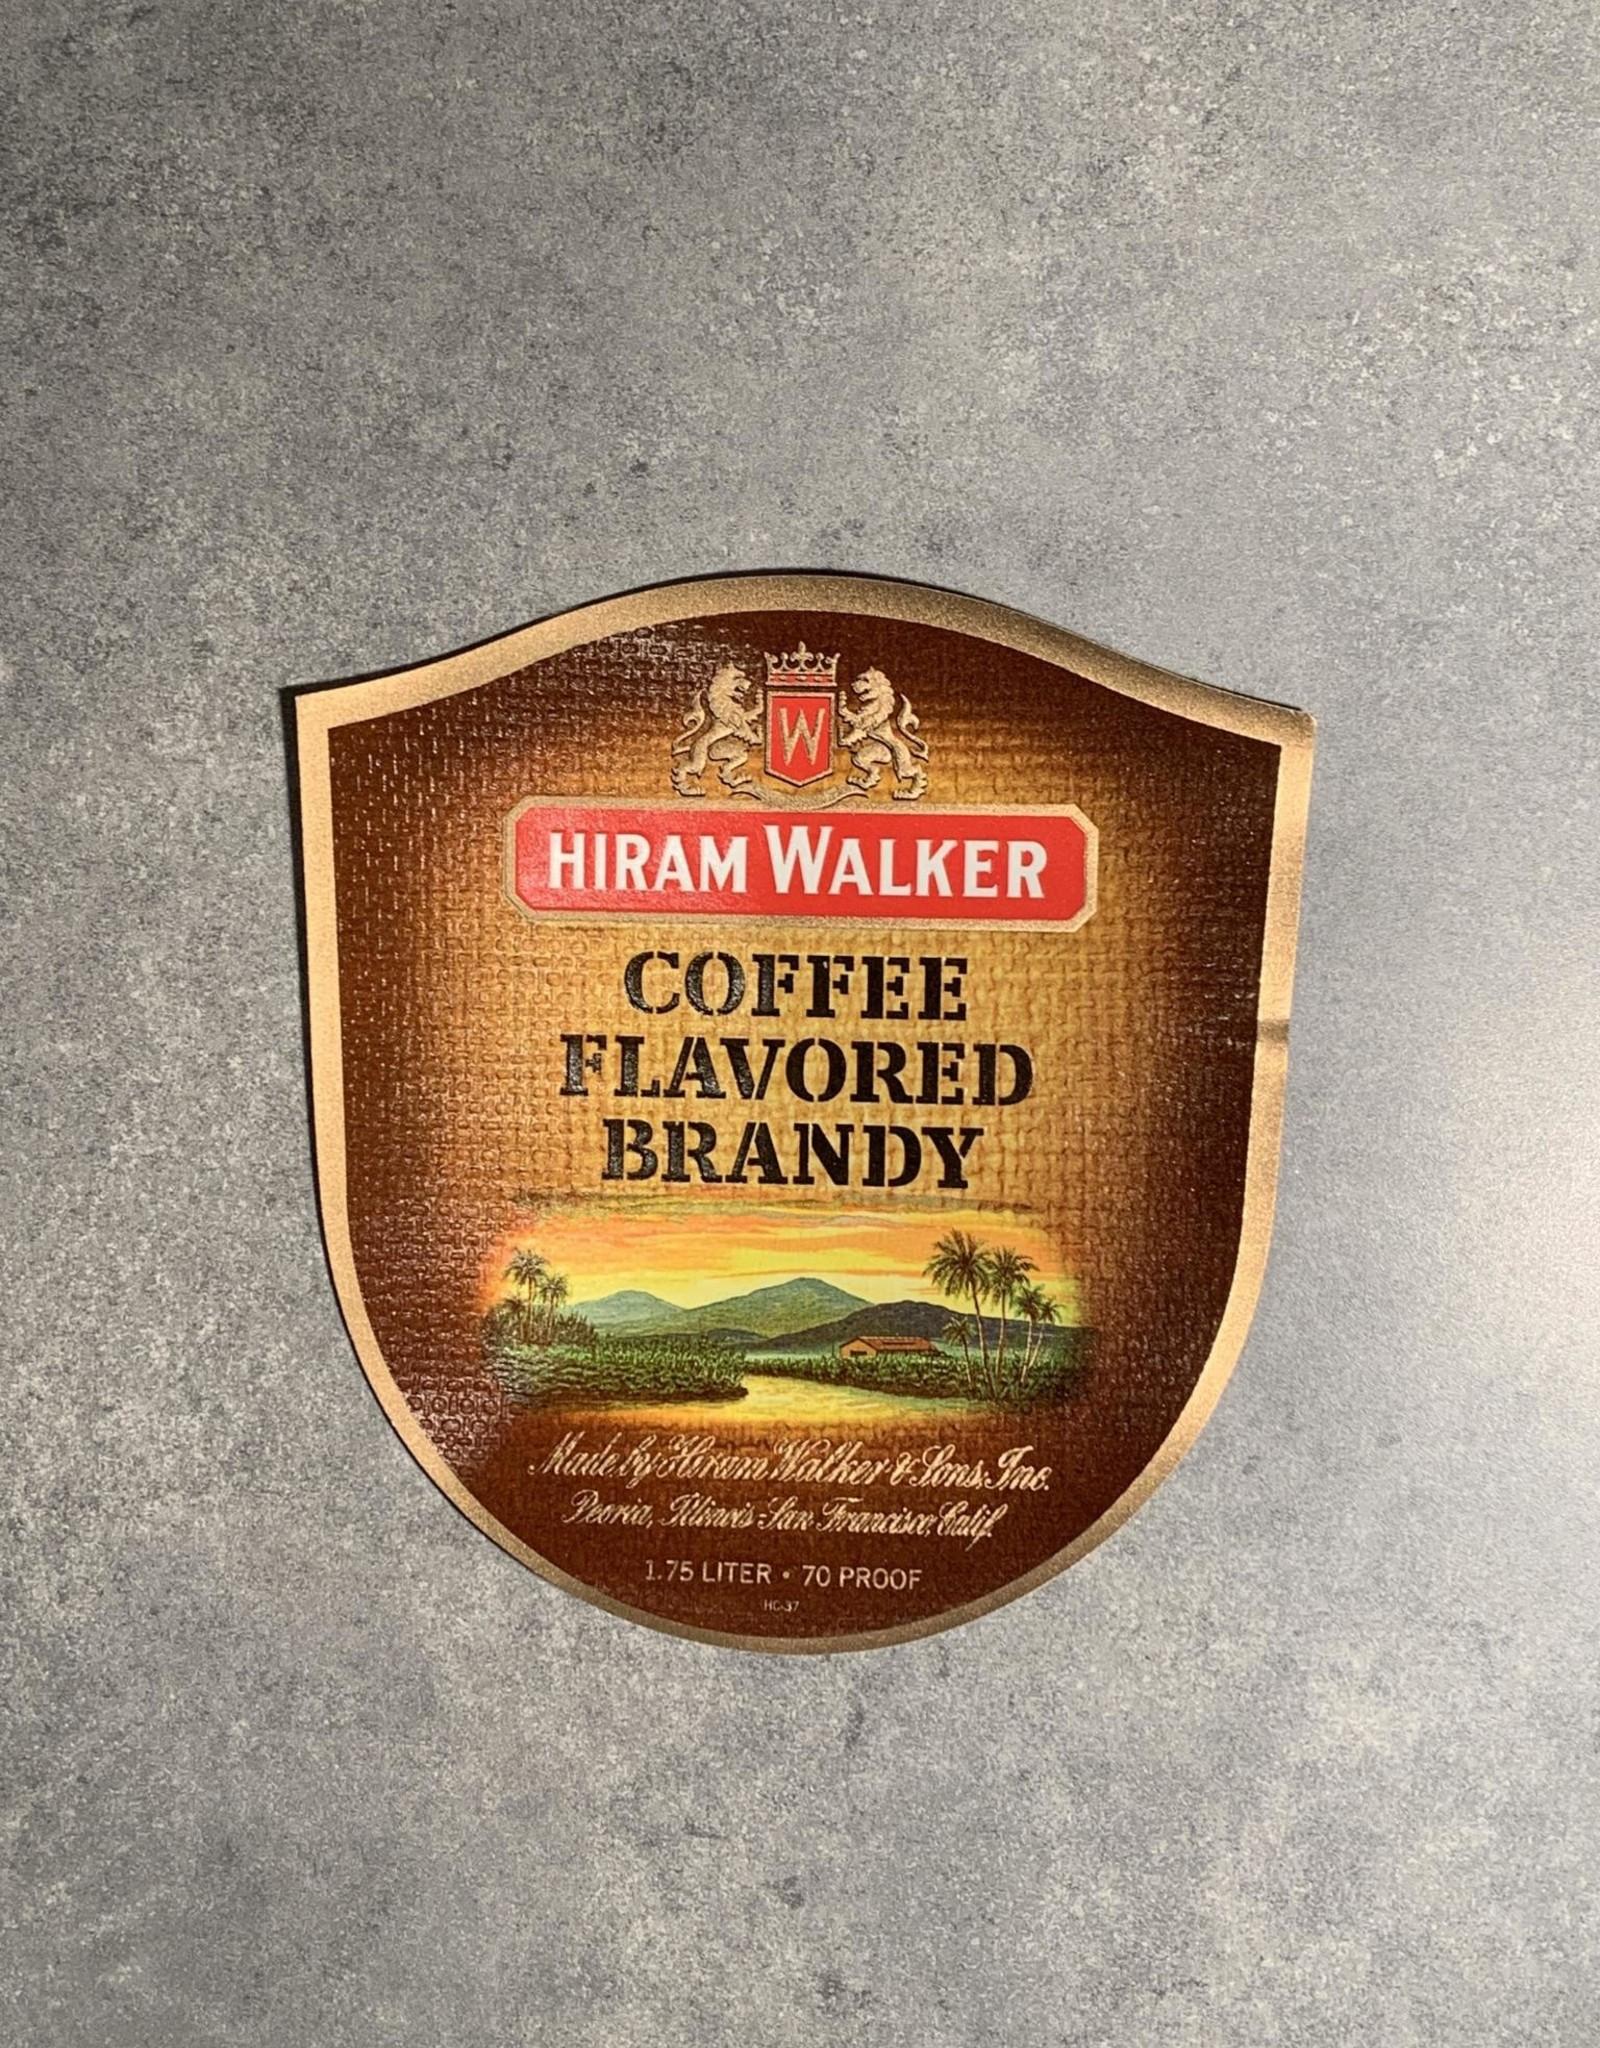 UA Merch Hiram Walker & Sons Peoria Il. Coffee Brandy Label